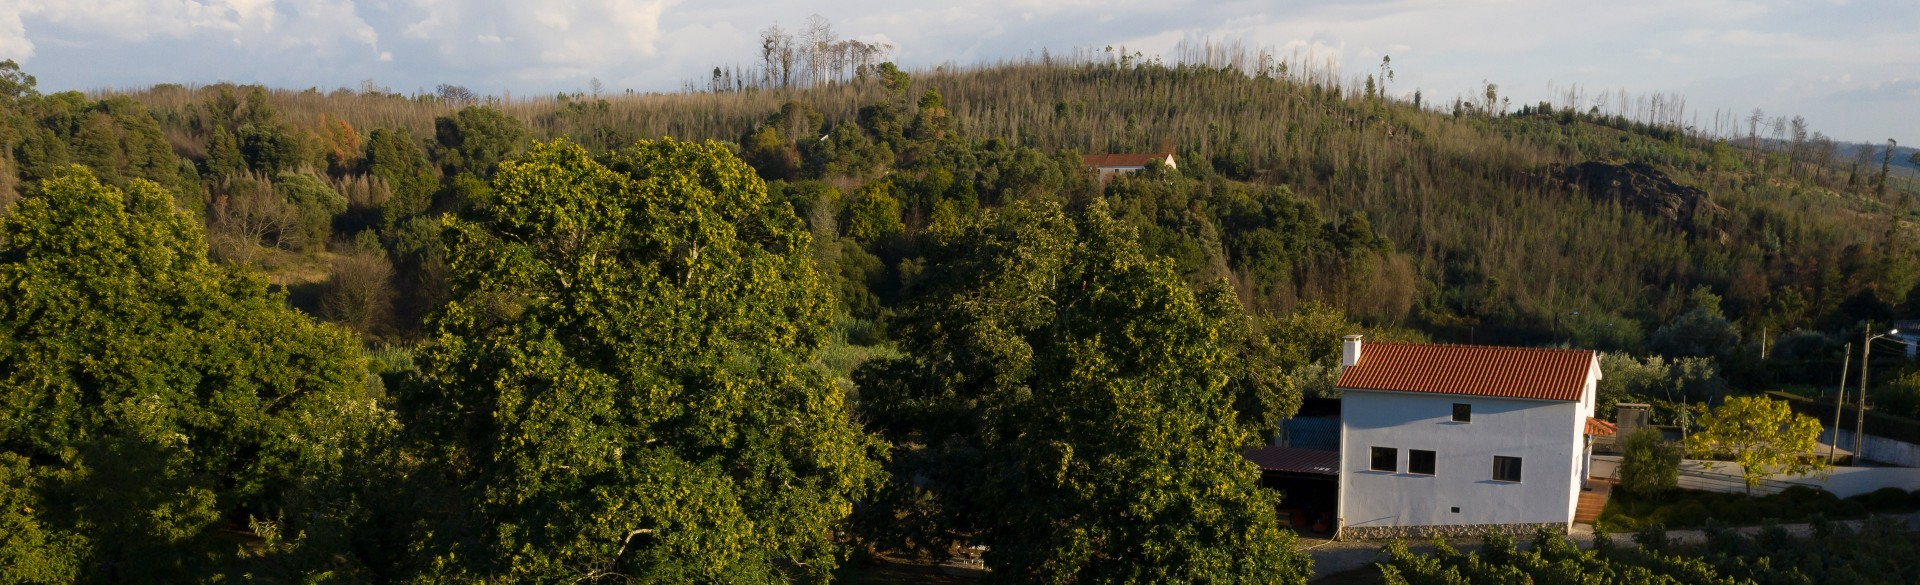 Quinta do Sobral - Solar